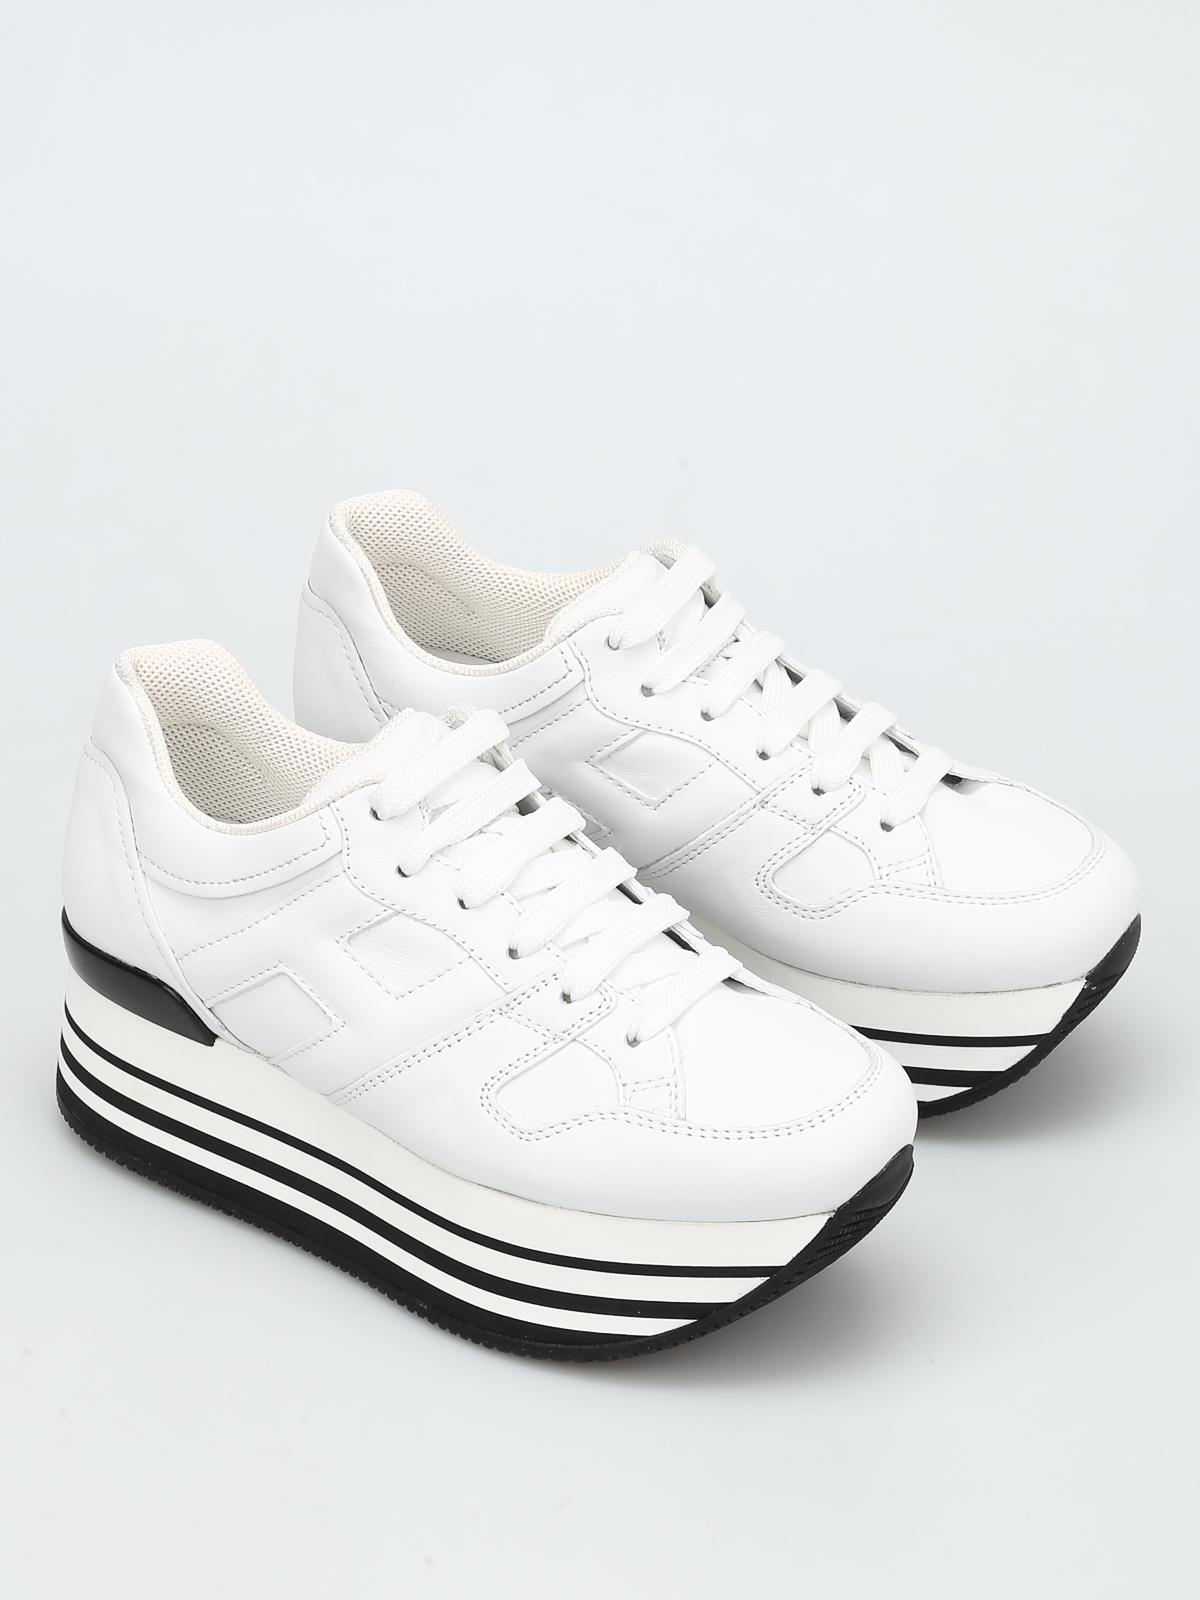 Hogan - Maxi 222 leather sneakers - trainers - GYW2830T541BTLB001